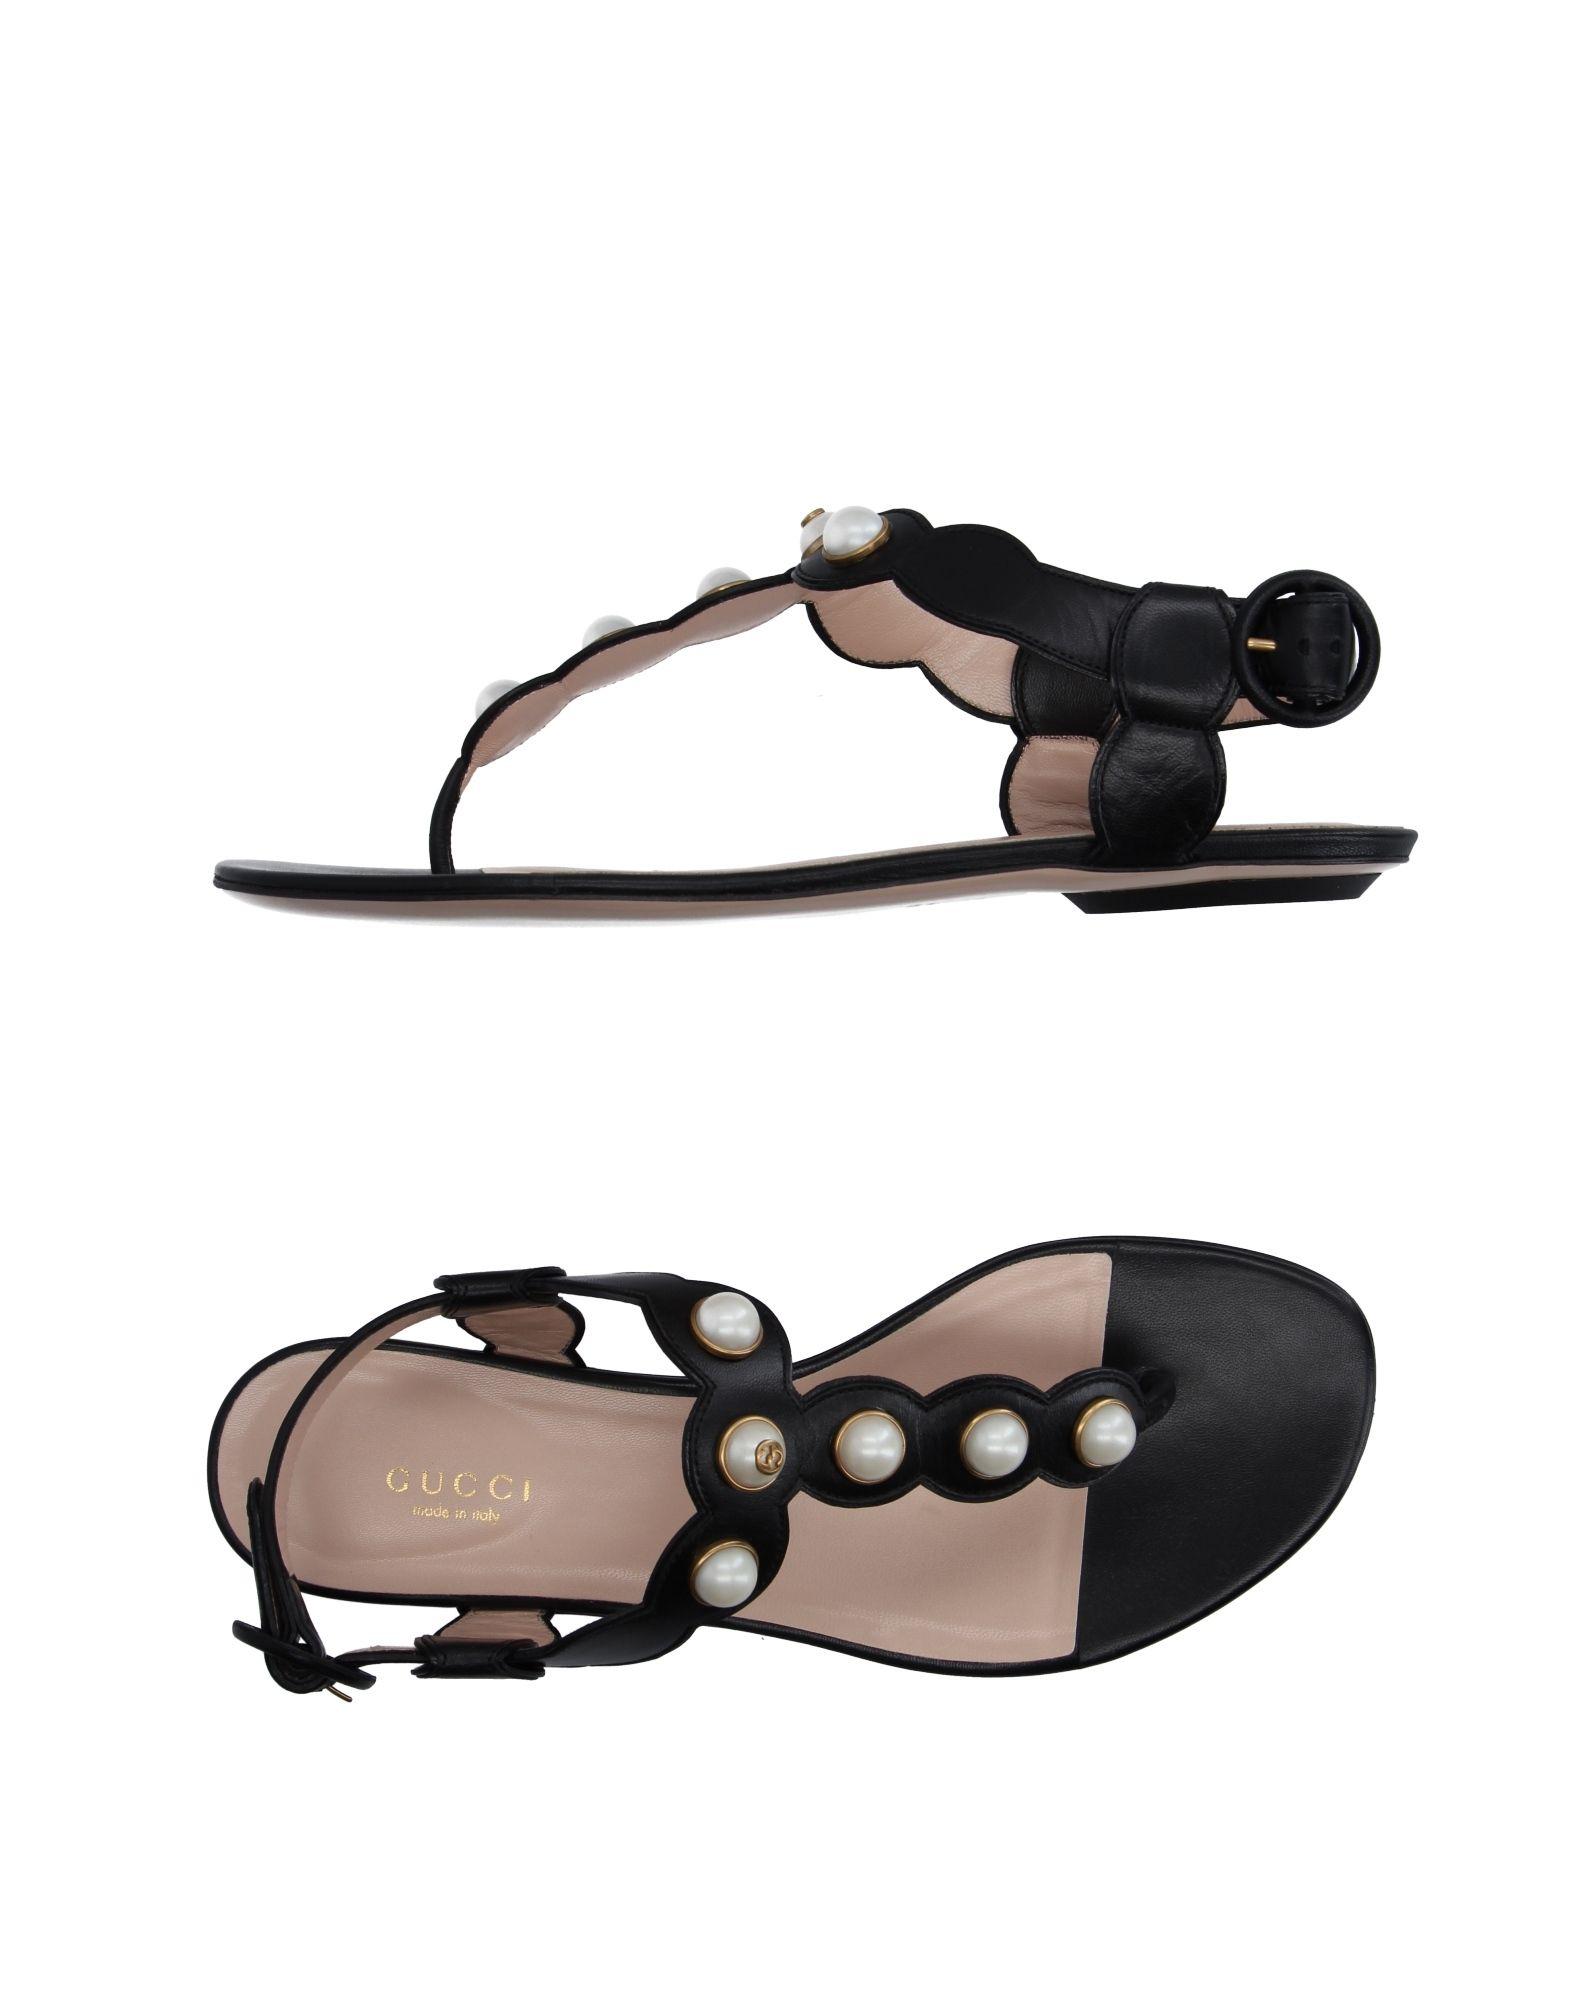 Gucci Flip Flops In Black